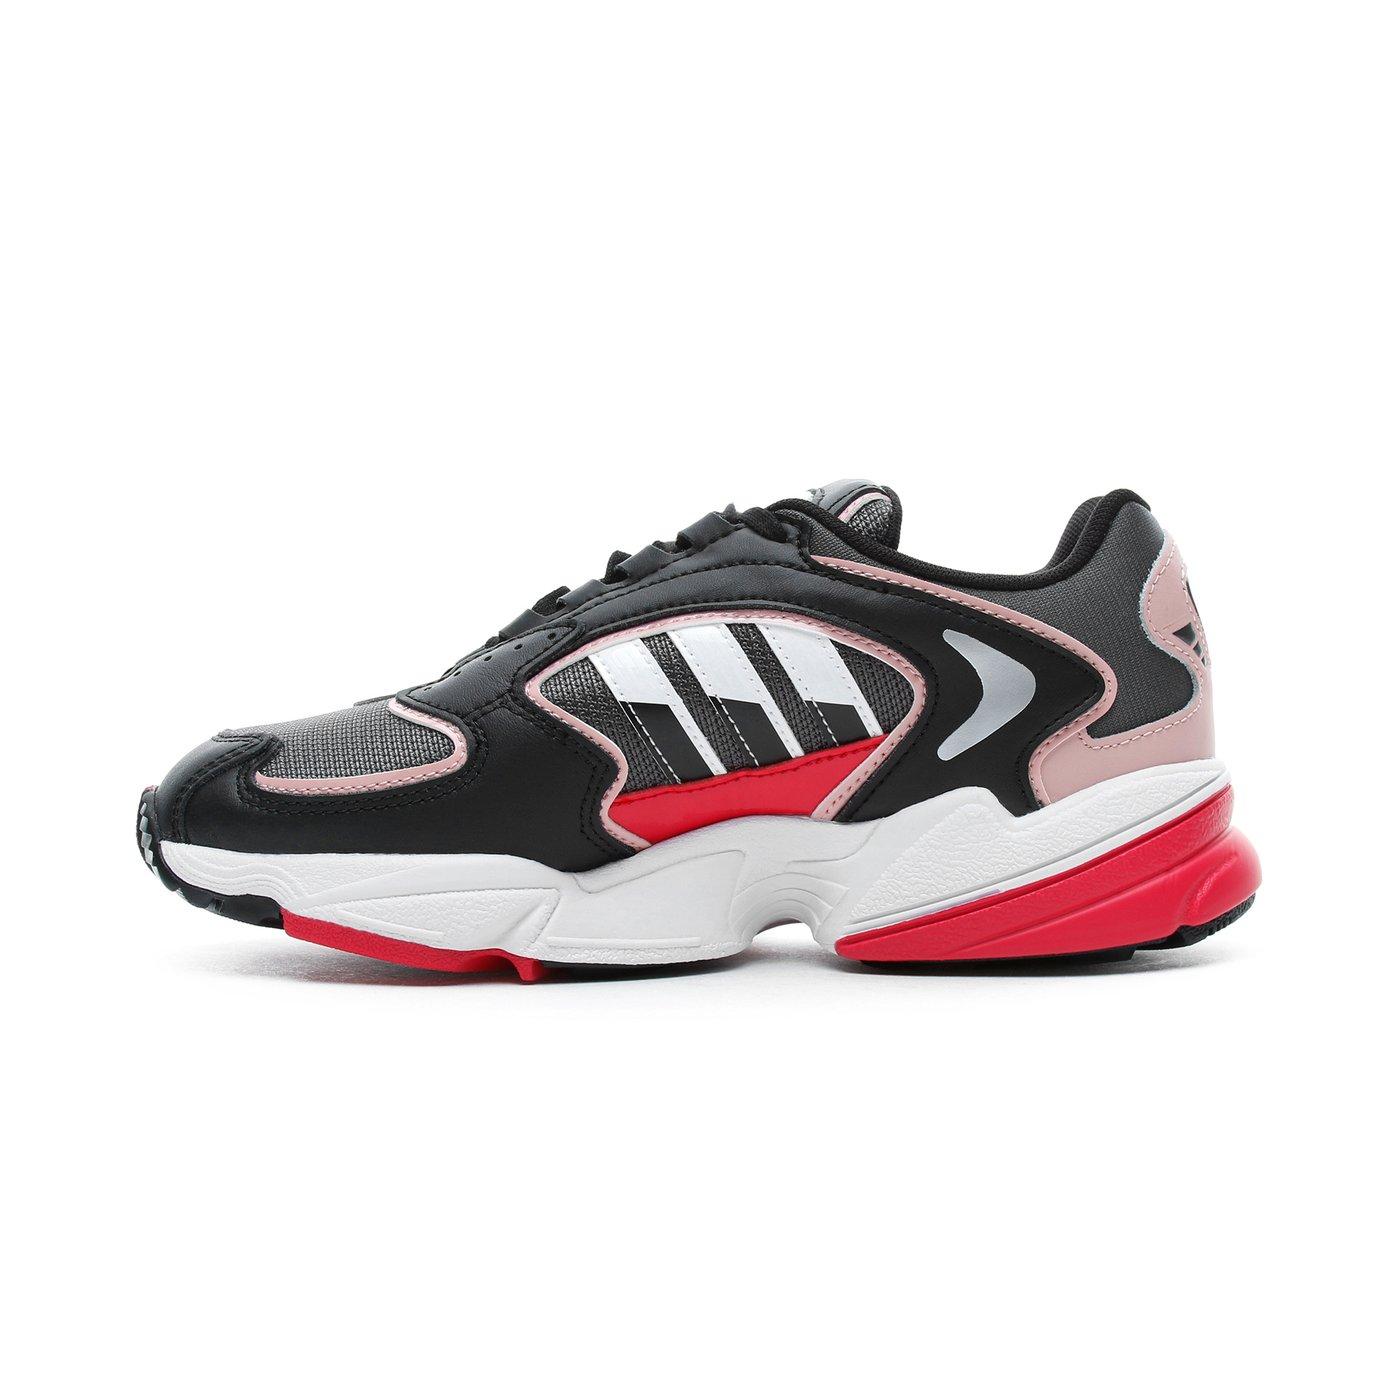 adidas Falcon 2000 Kadın Gri - Siyah Spor Ayakkabı